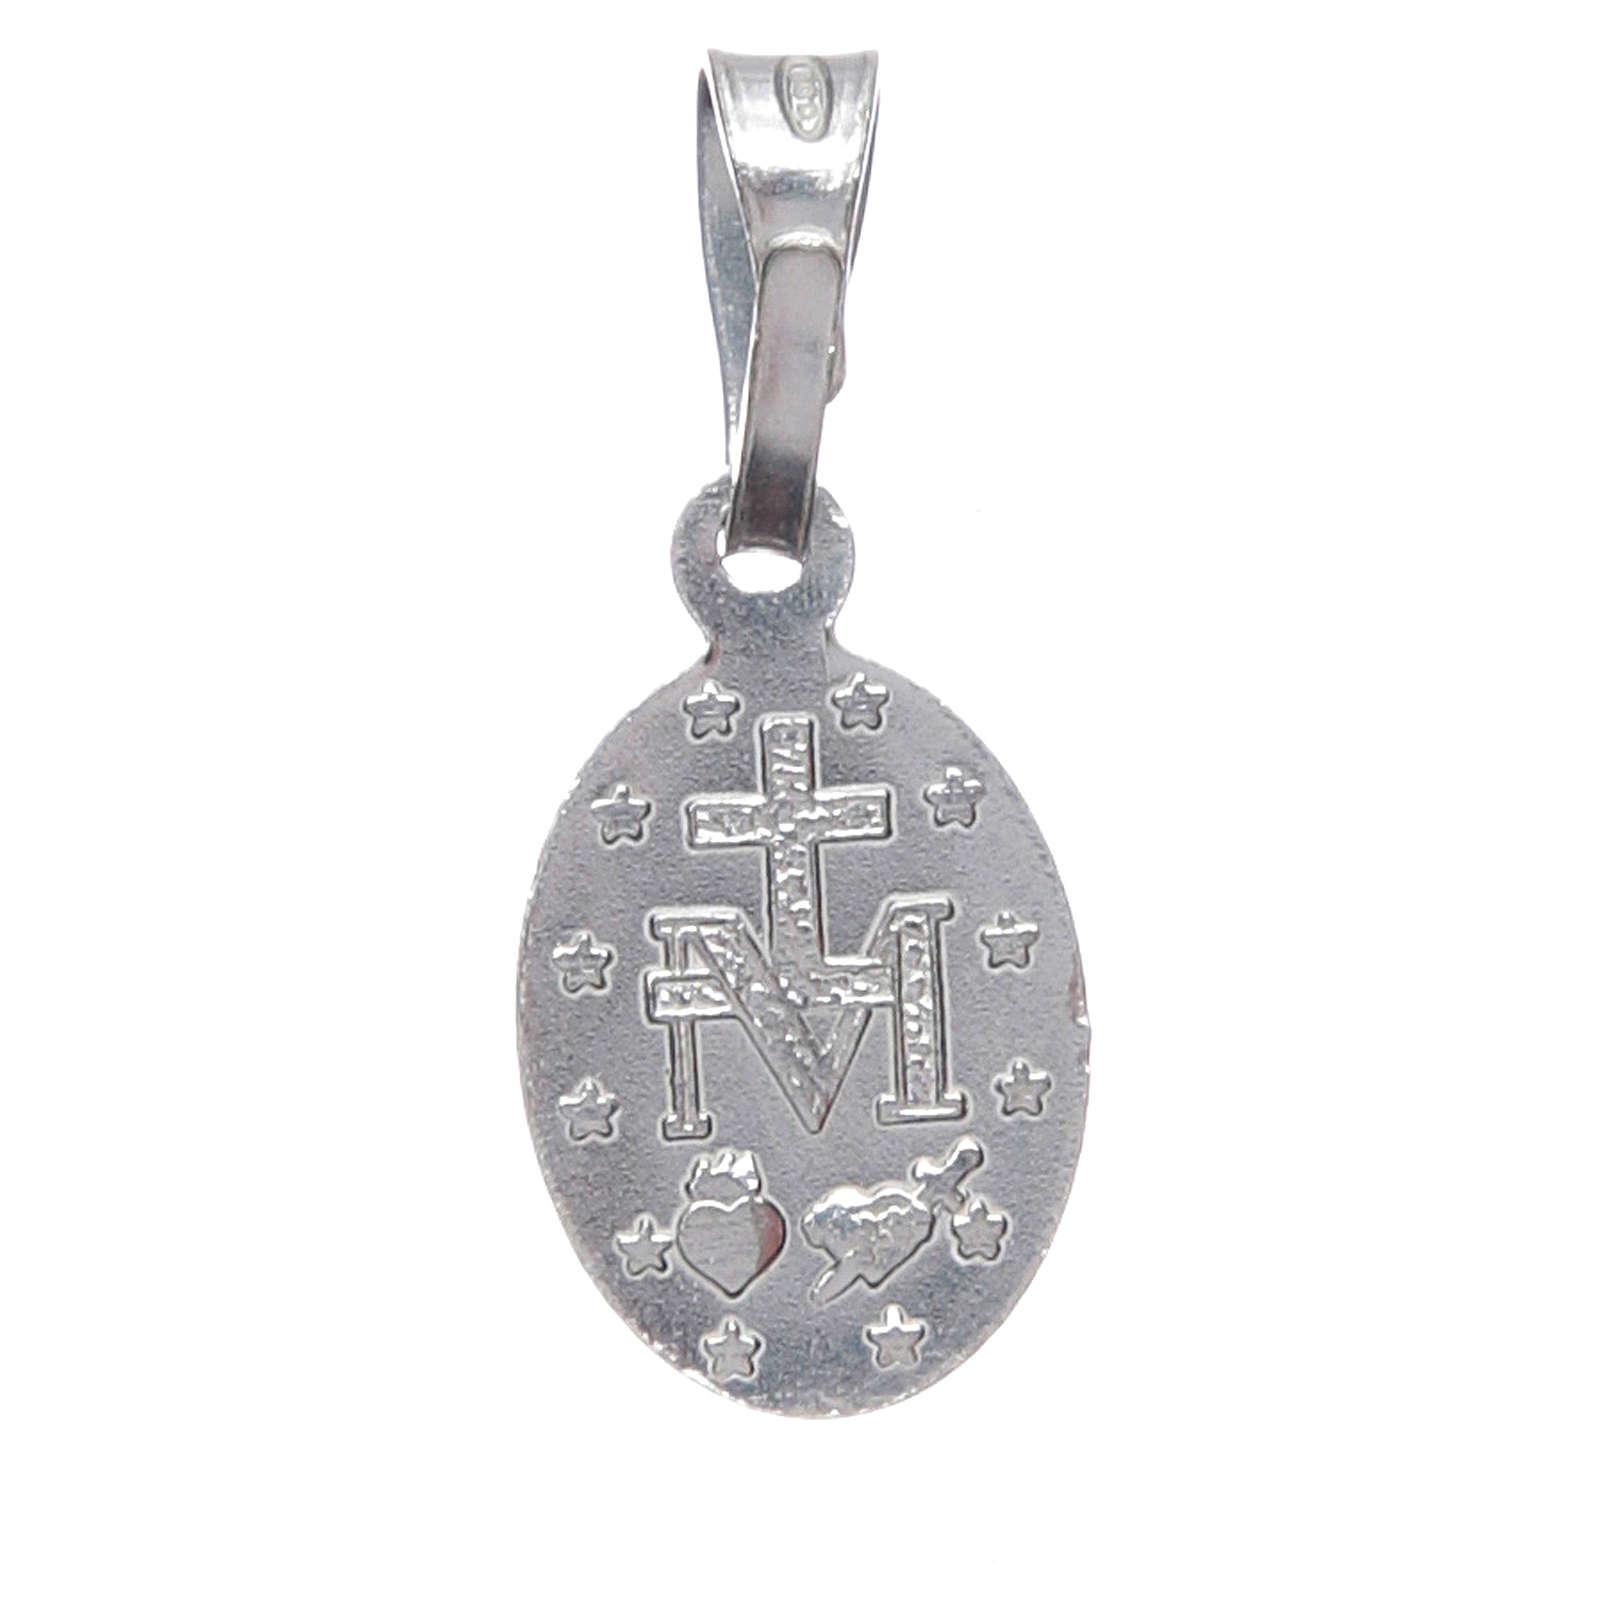 Miraculous medal in silver 925 1 cm h 4